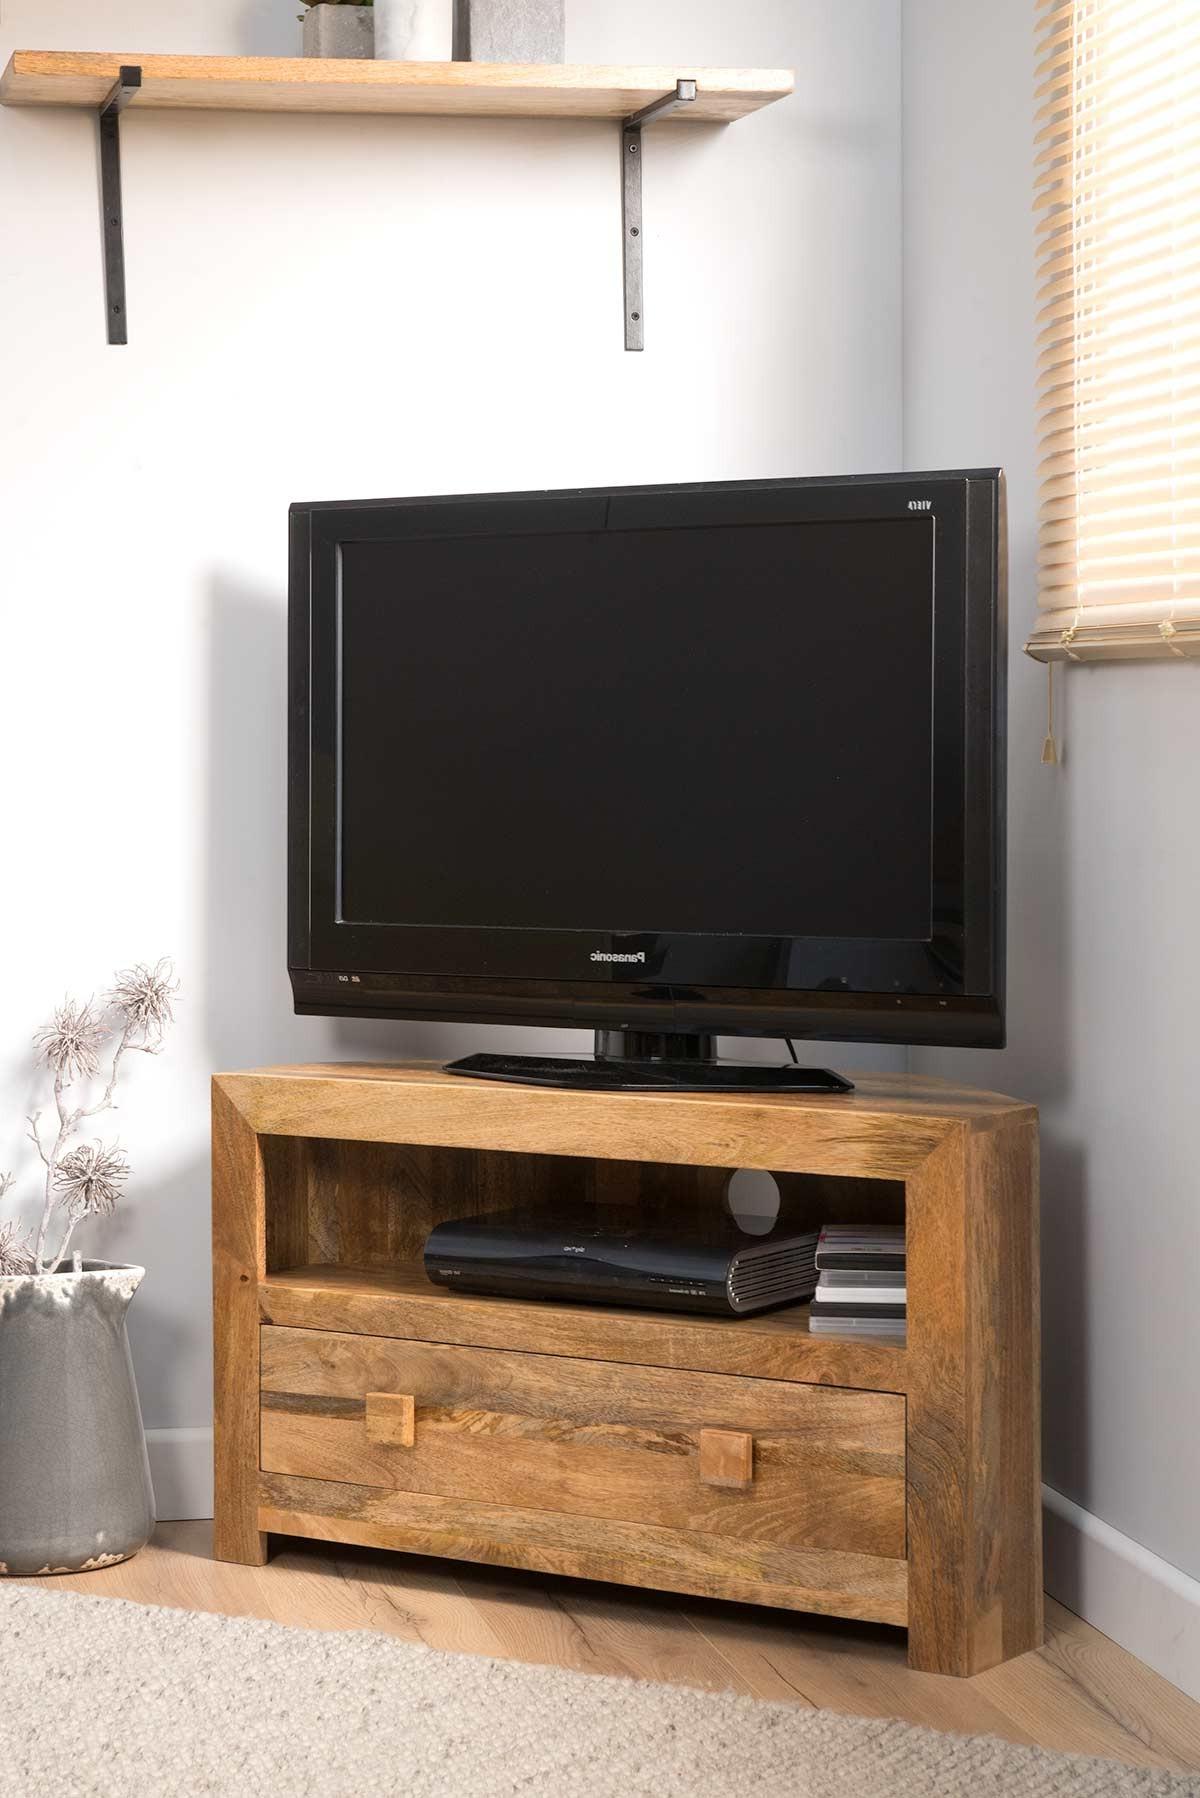 Dakota Light Mango Small Corner Tv Stand | Casa Bella With Regard To Hex Corner Tv Stands (View 14 of 20)